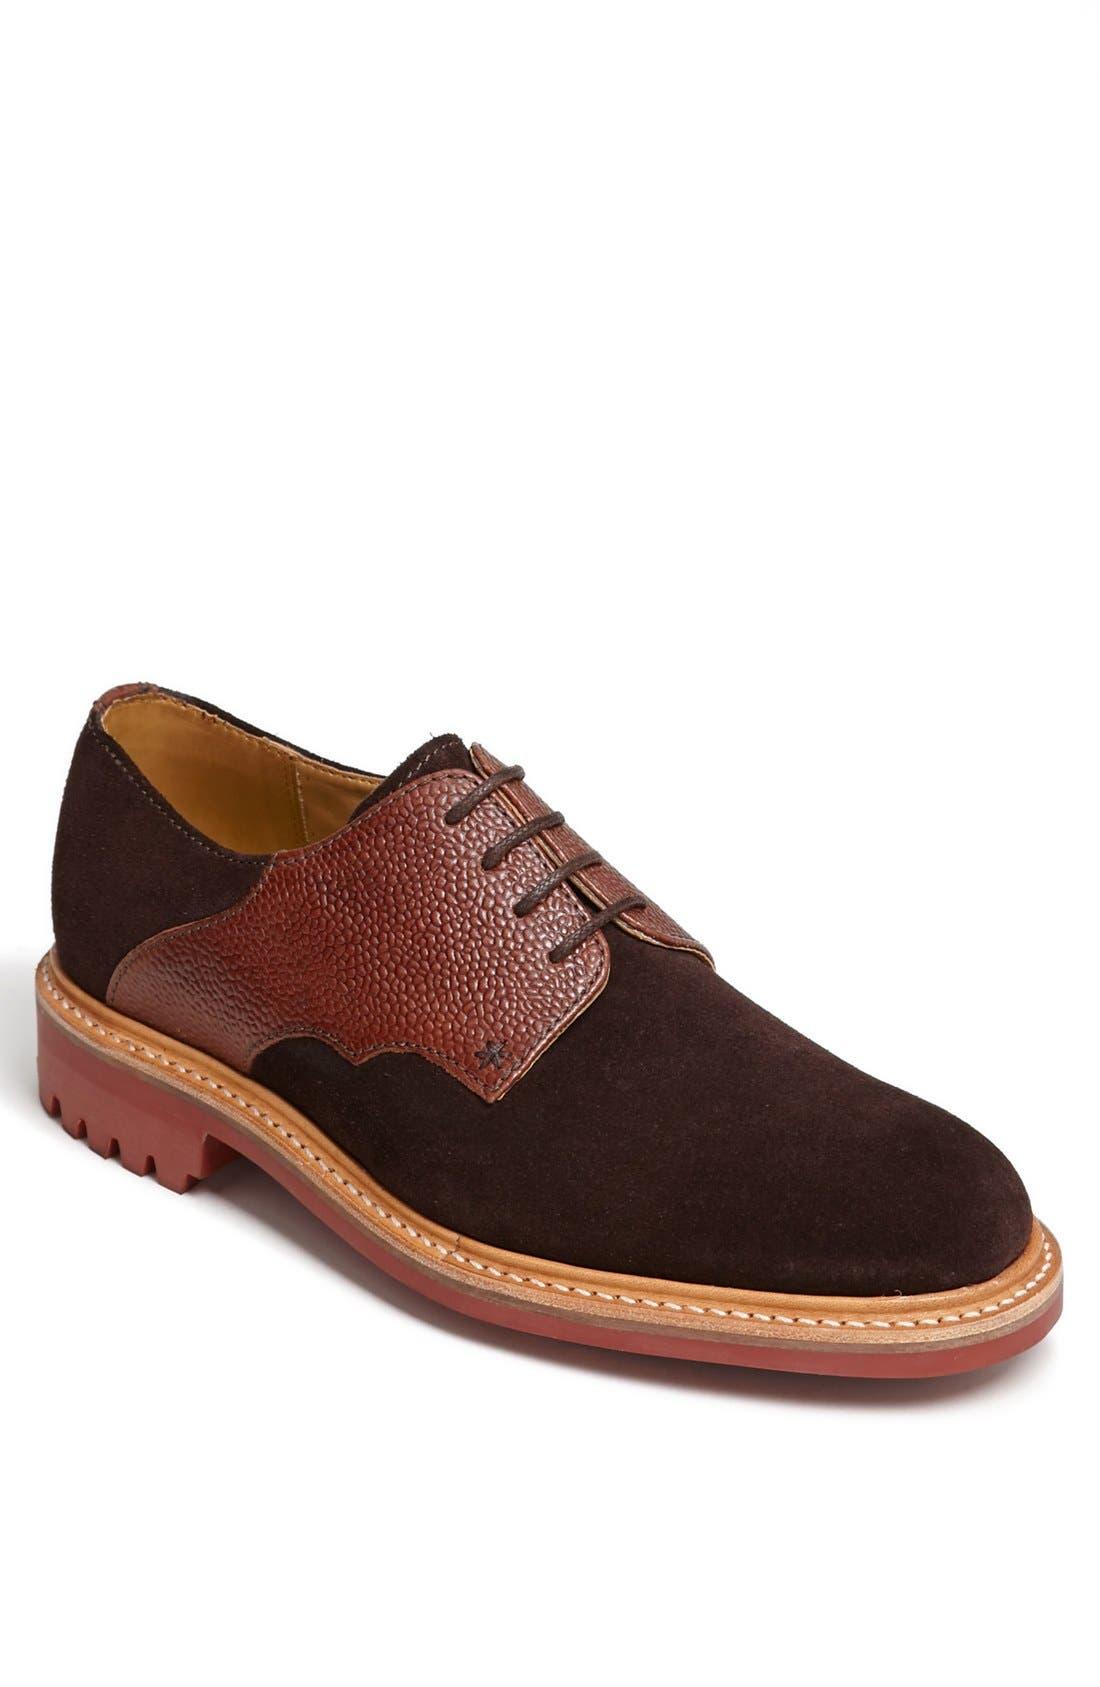 Alternate Image 1 Selected - Oliver Sweeney 'Sutton' Saddle Shoe